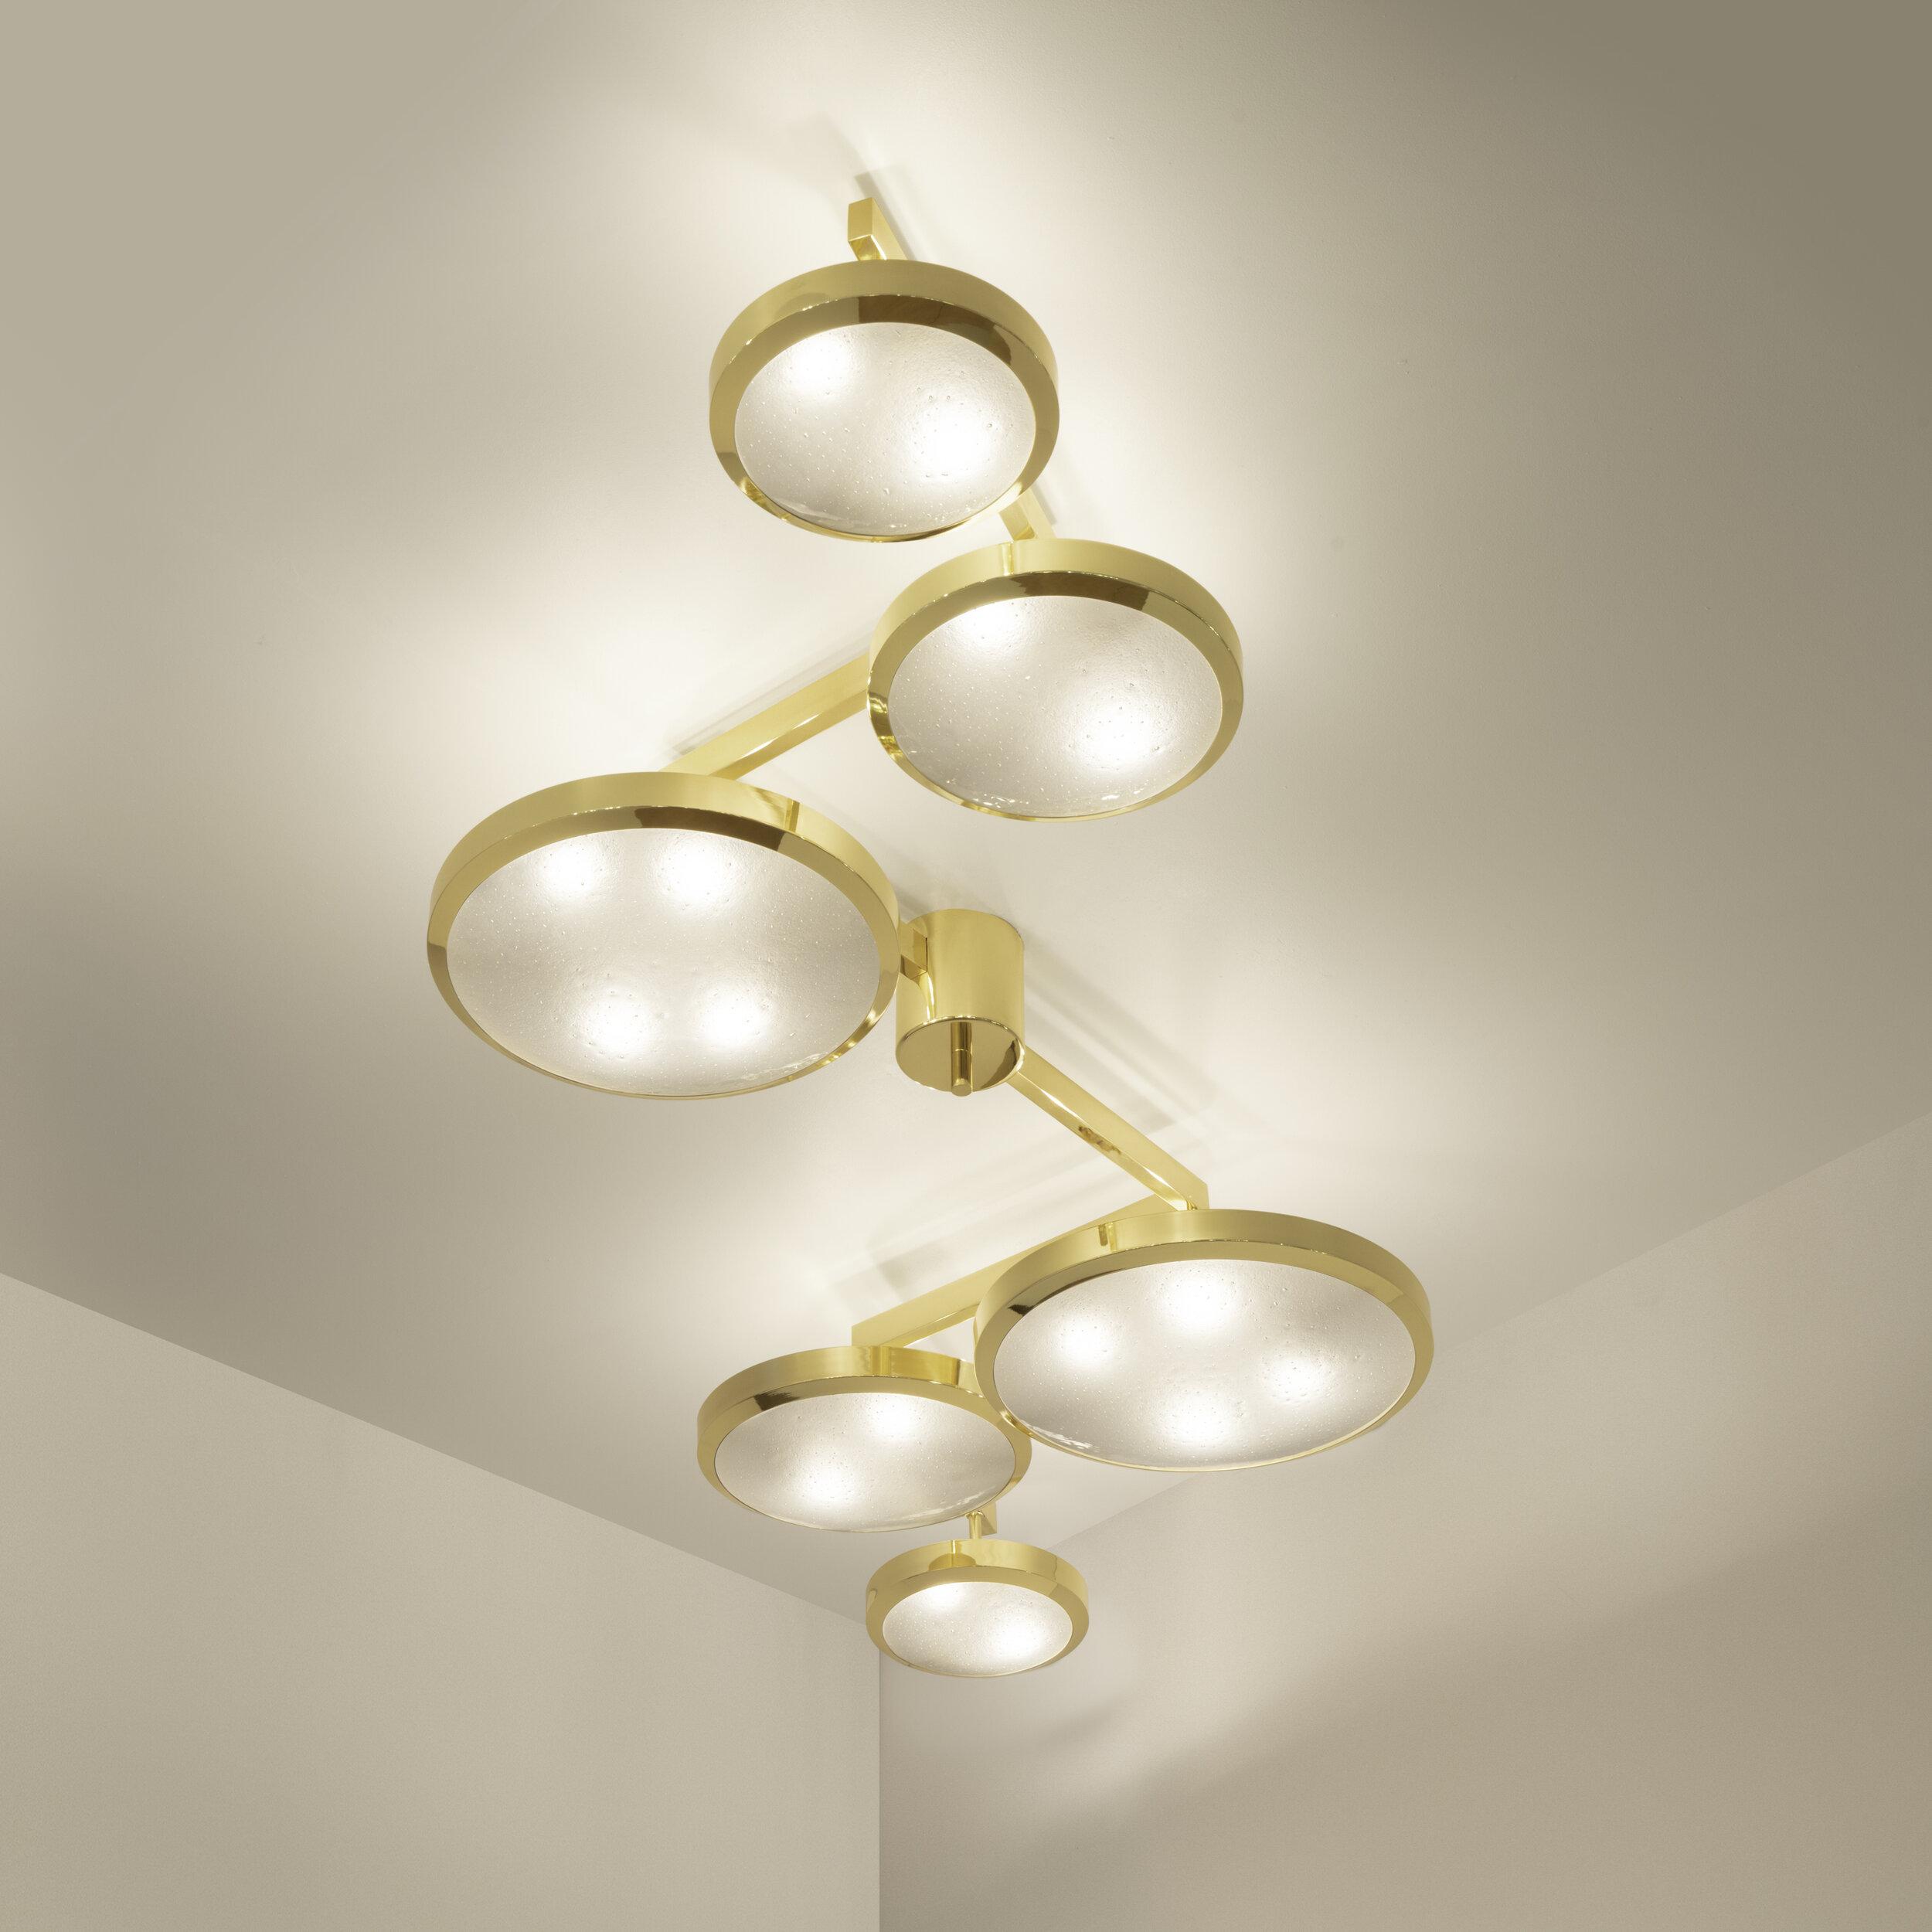 Geometria Sospesa Ceiling Light